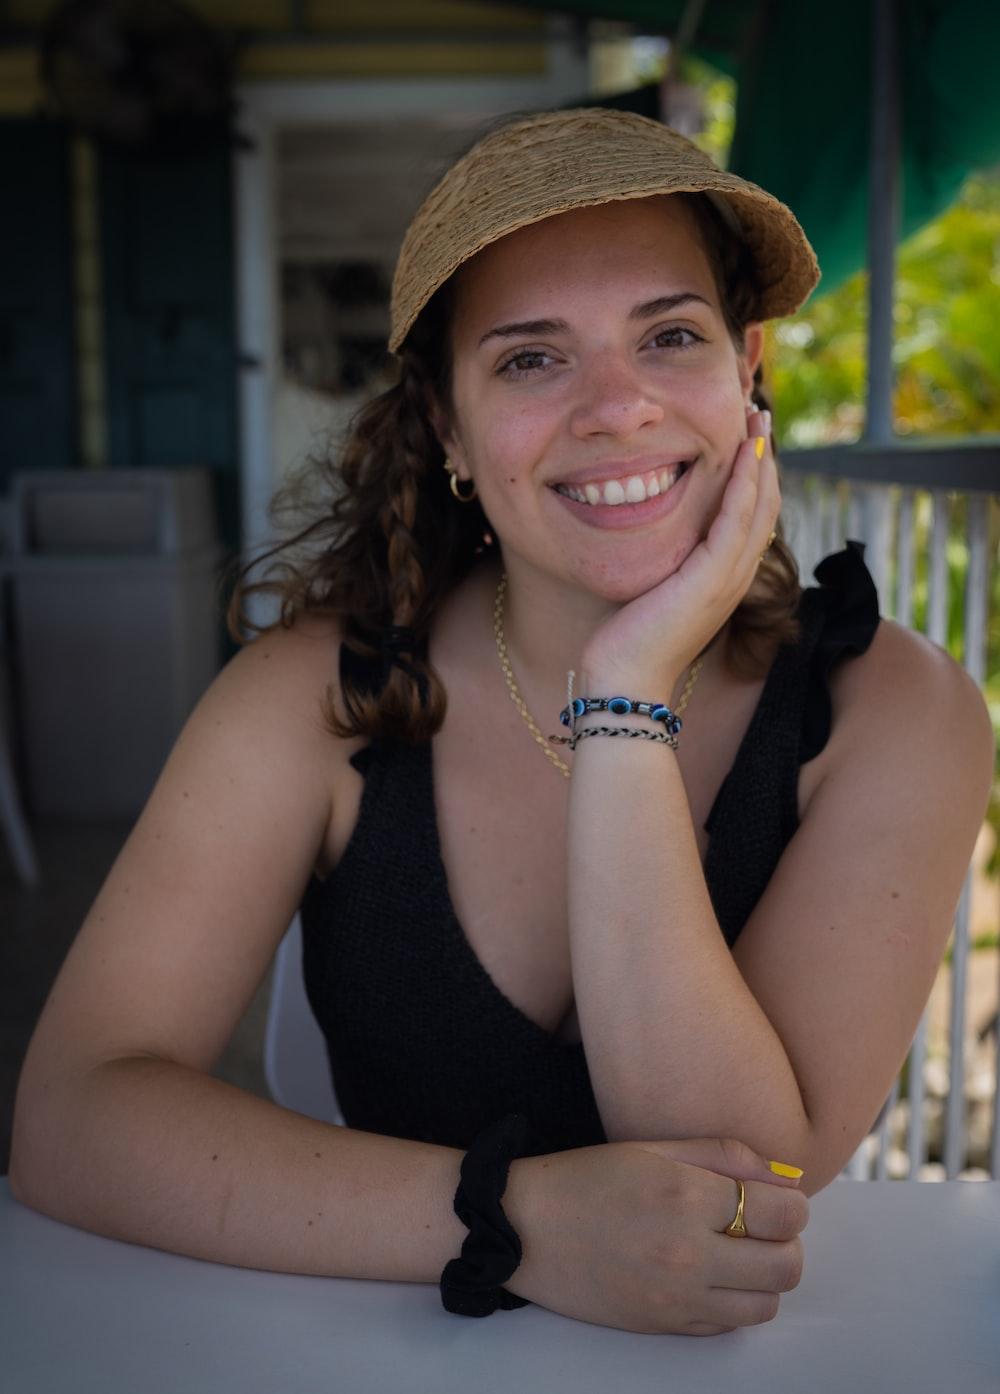 smiling woman in black tank top wearing brown hat